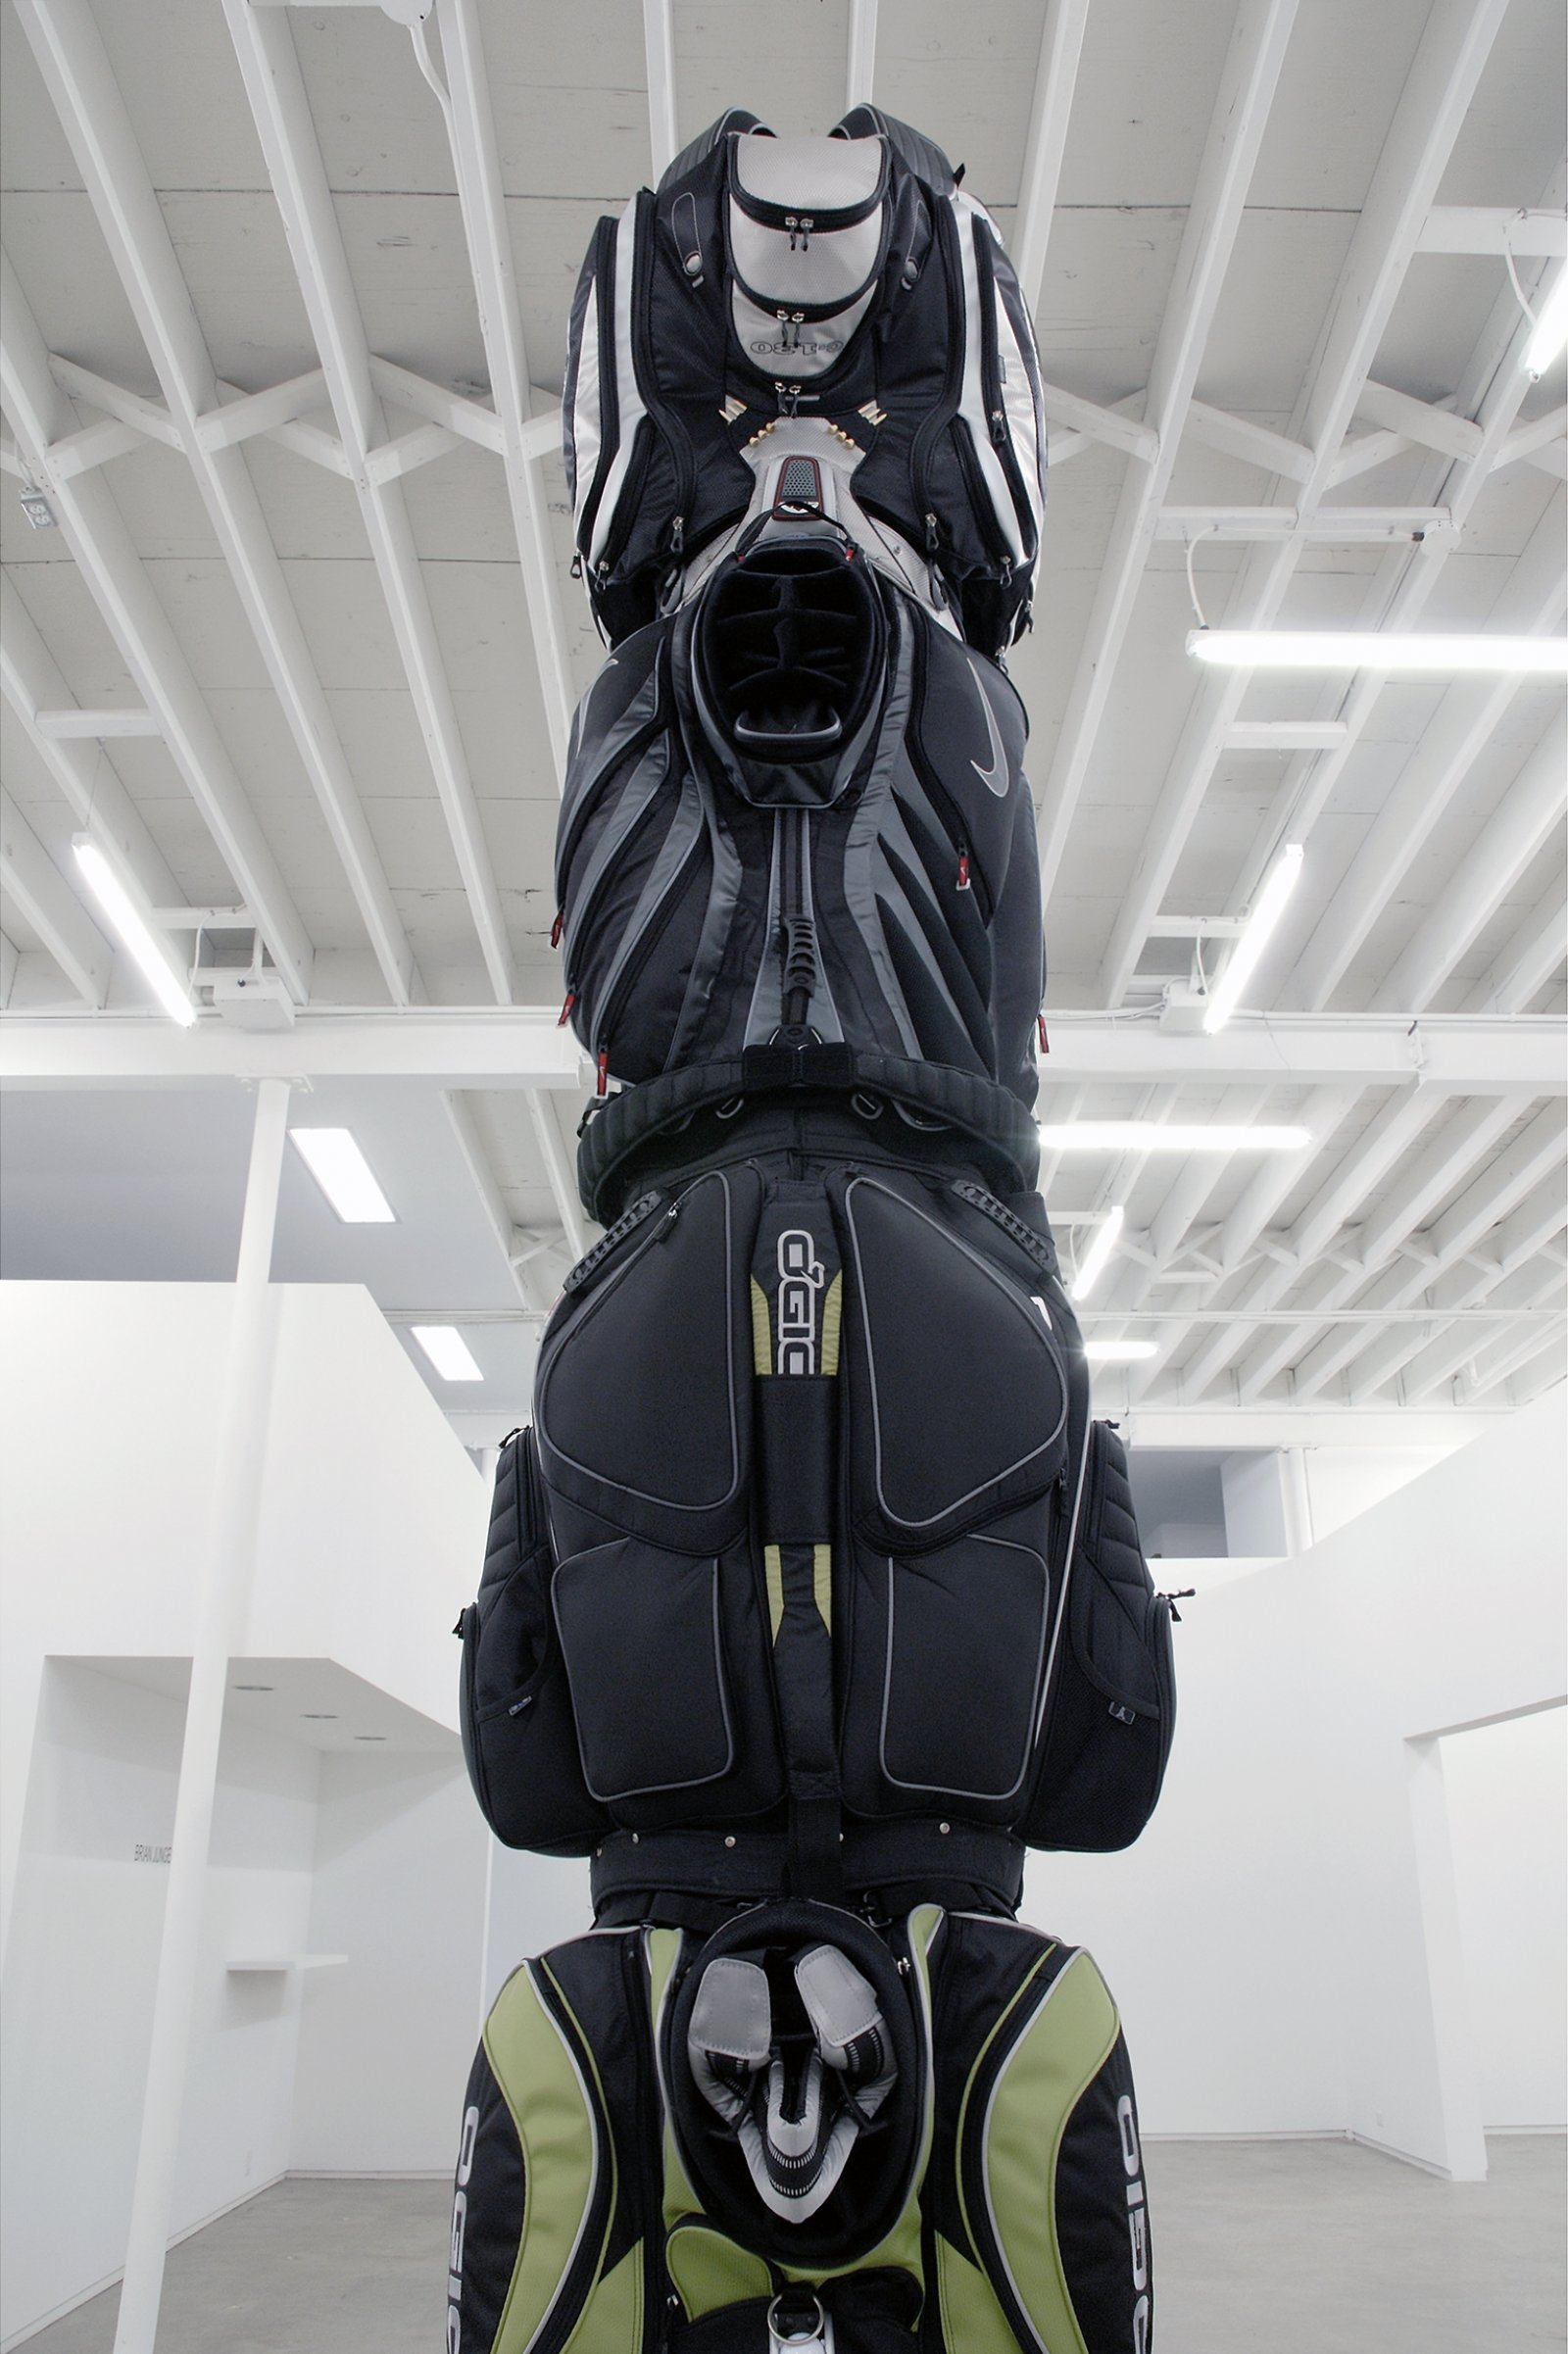 Brian Jungen, 2010 (detail), 2007, golf bags, cardboard tube, 149 x 29 x 32 in. (378 x 74 x 81 cm) by Brian Jungen